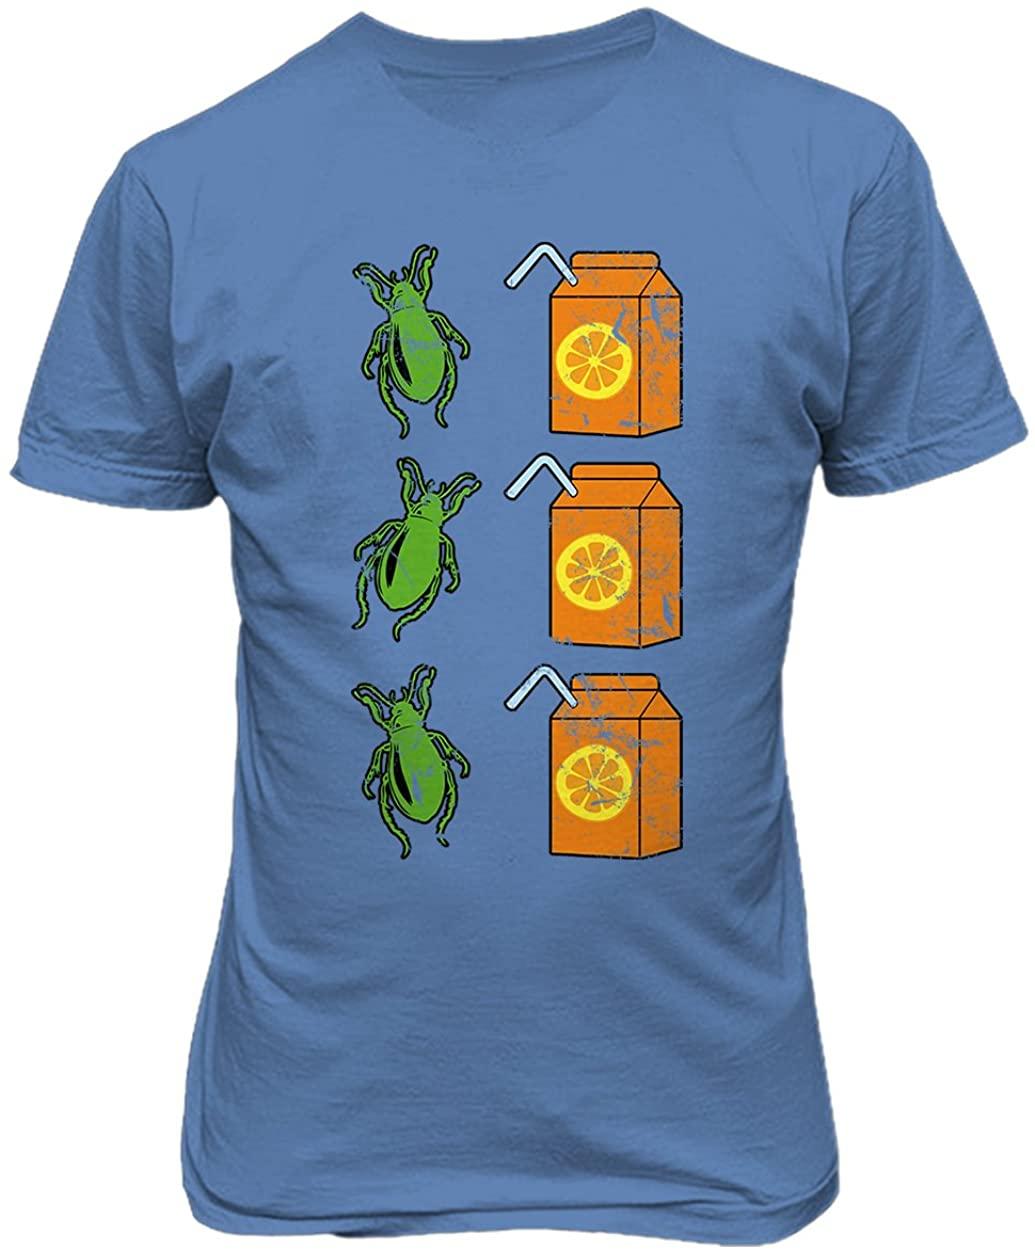 RIVEBELLA New Graphic Shirt Beetle and Juice Novelty Tee Beetlejuice Men's T-Shirt